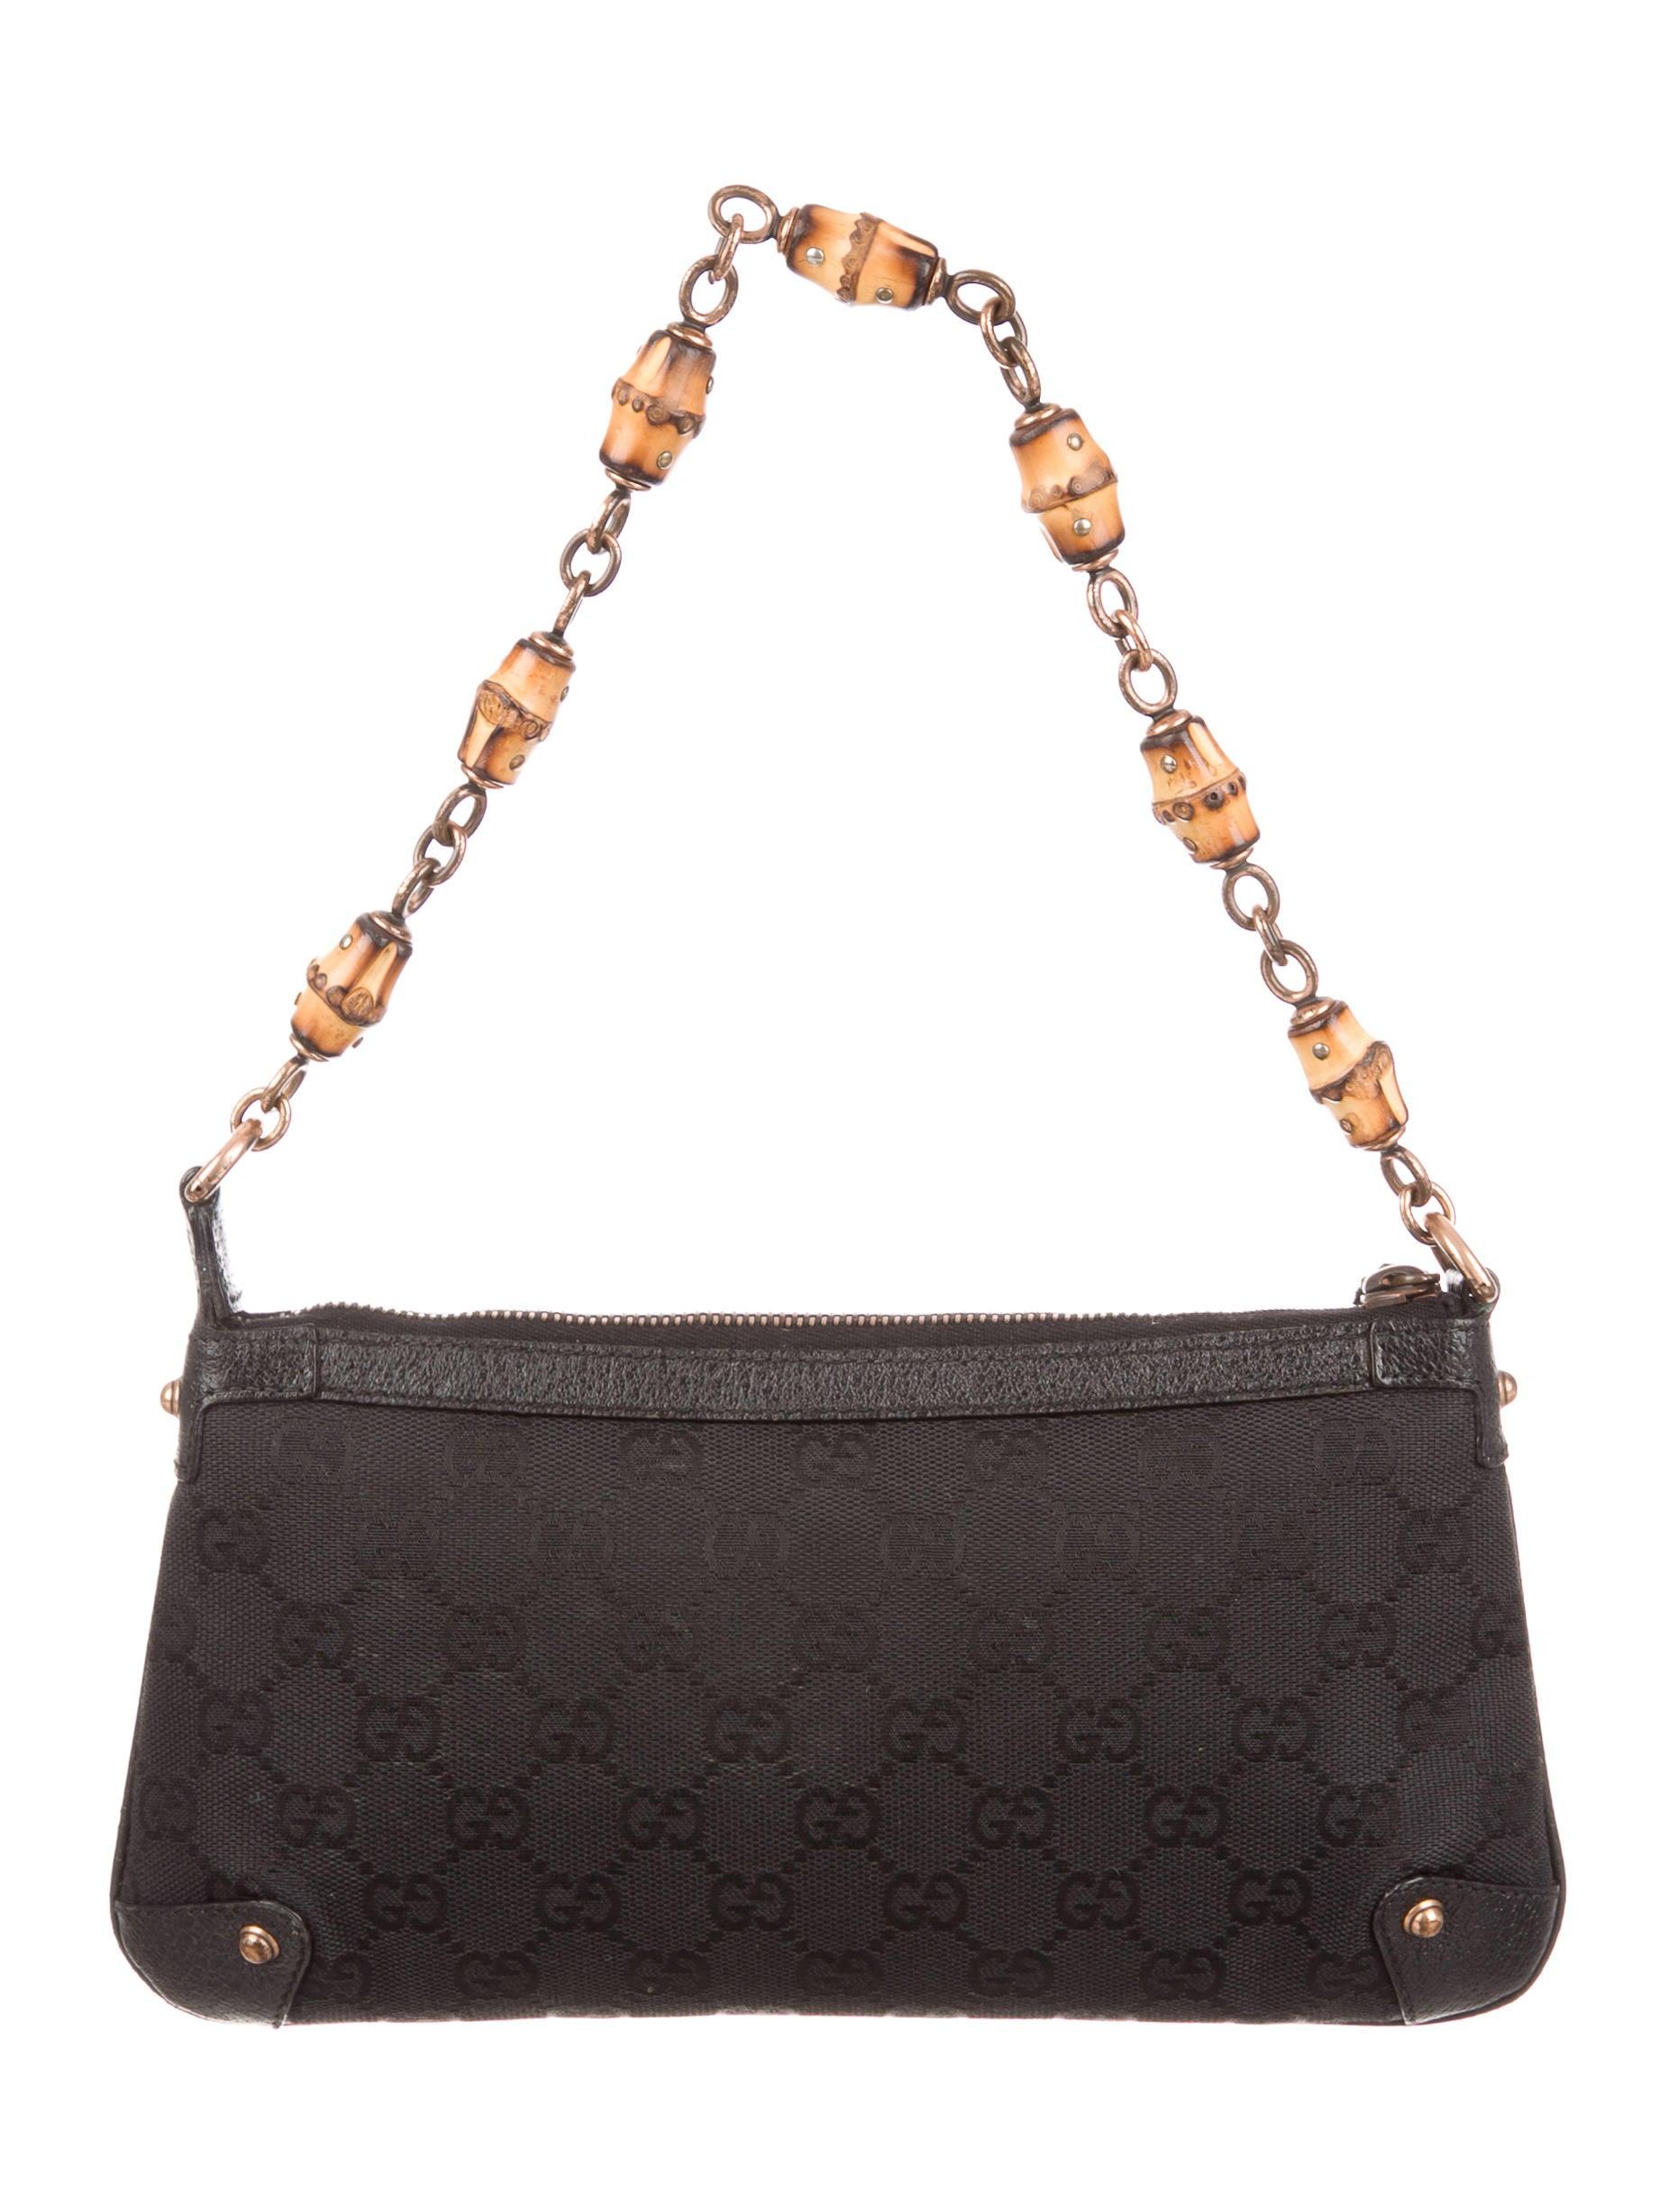 gucci gg canvas pochette handbags guc136274 the realreal. Black Bedroom Furniture Sets. Home Design Ideas